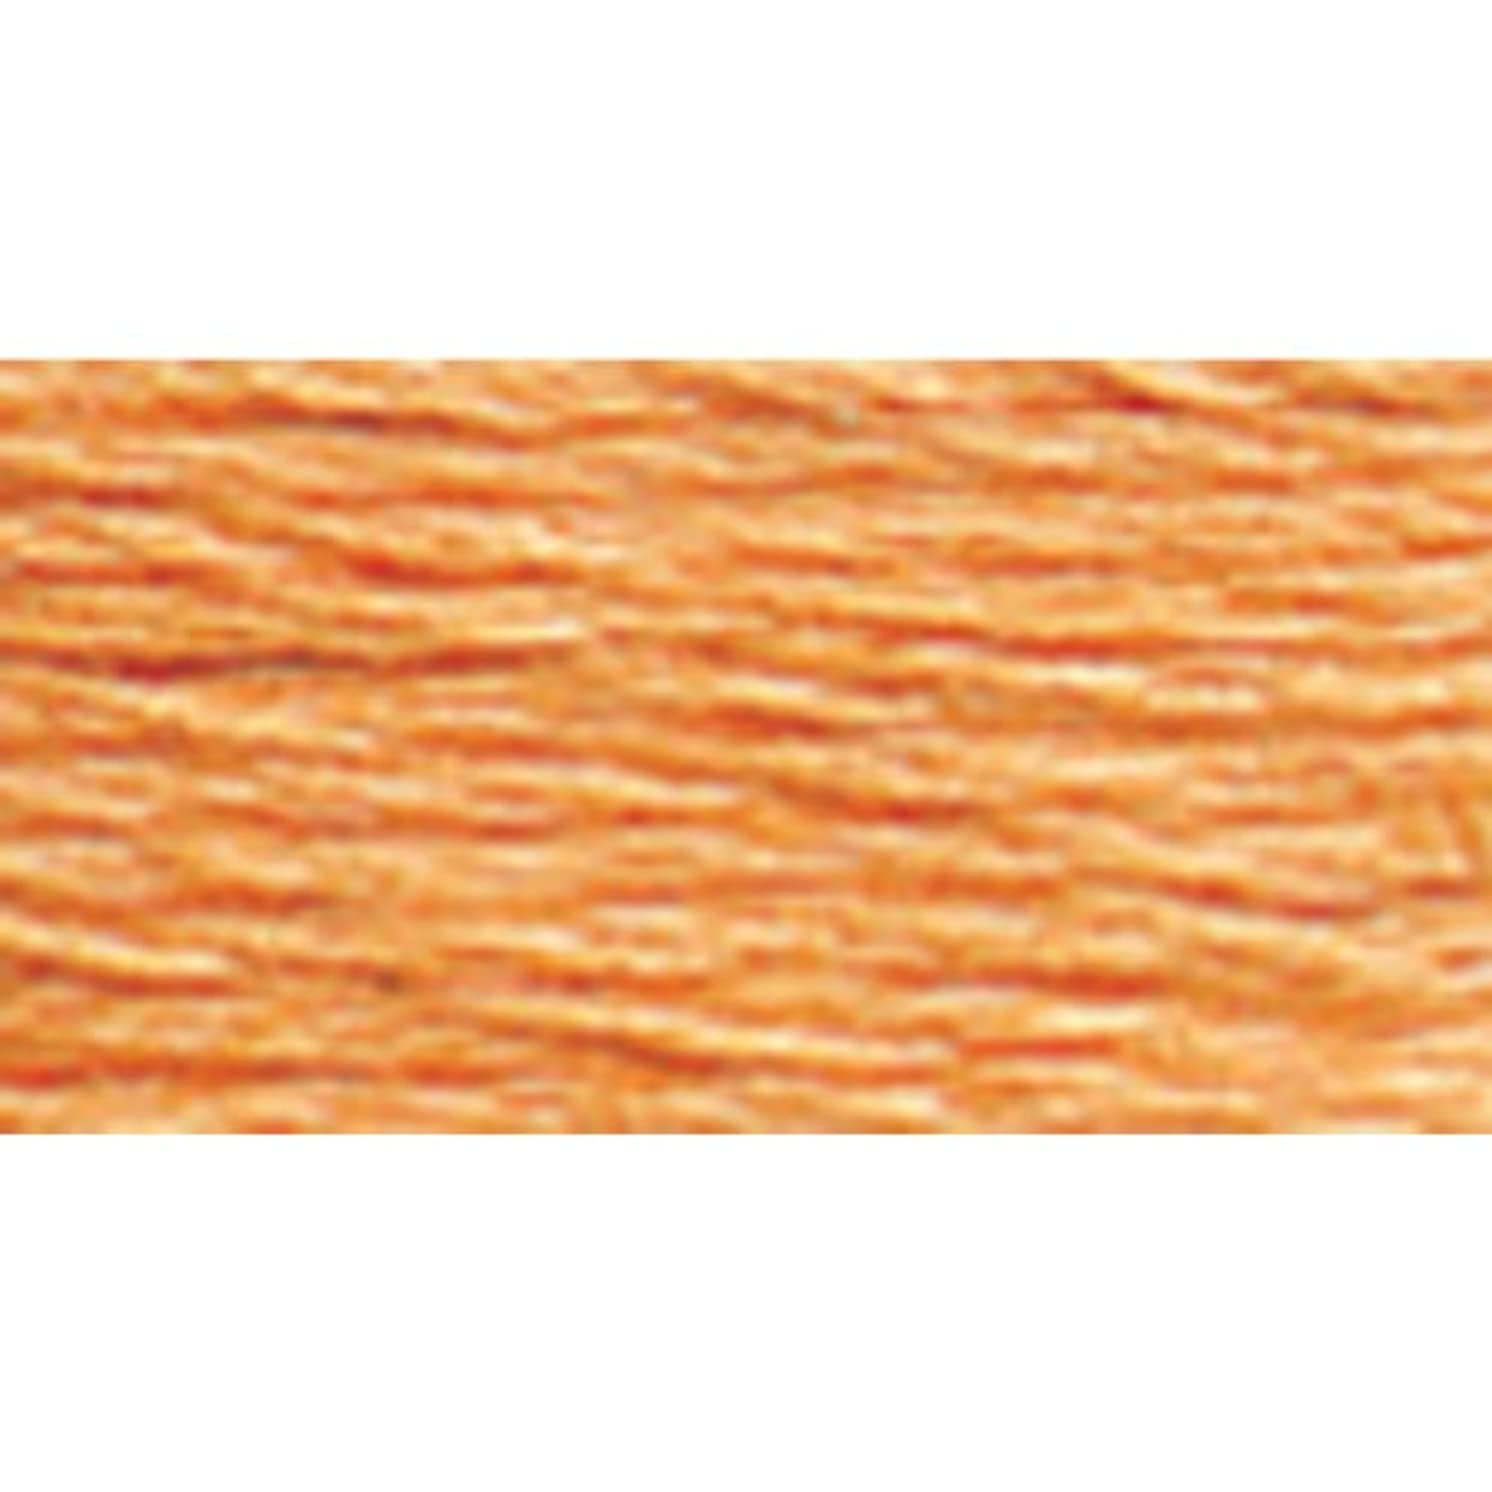 DMC 117-3825 Mouline Stranded Cotton Six Strand Embroidery Floss Thread, Pale Pumpkin, 8.7-Yard